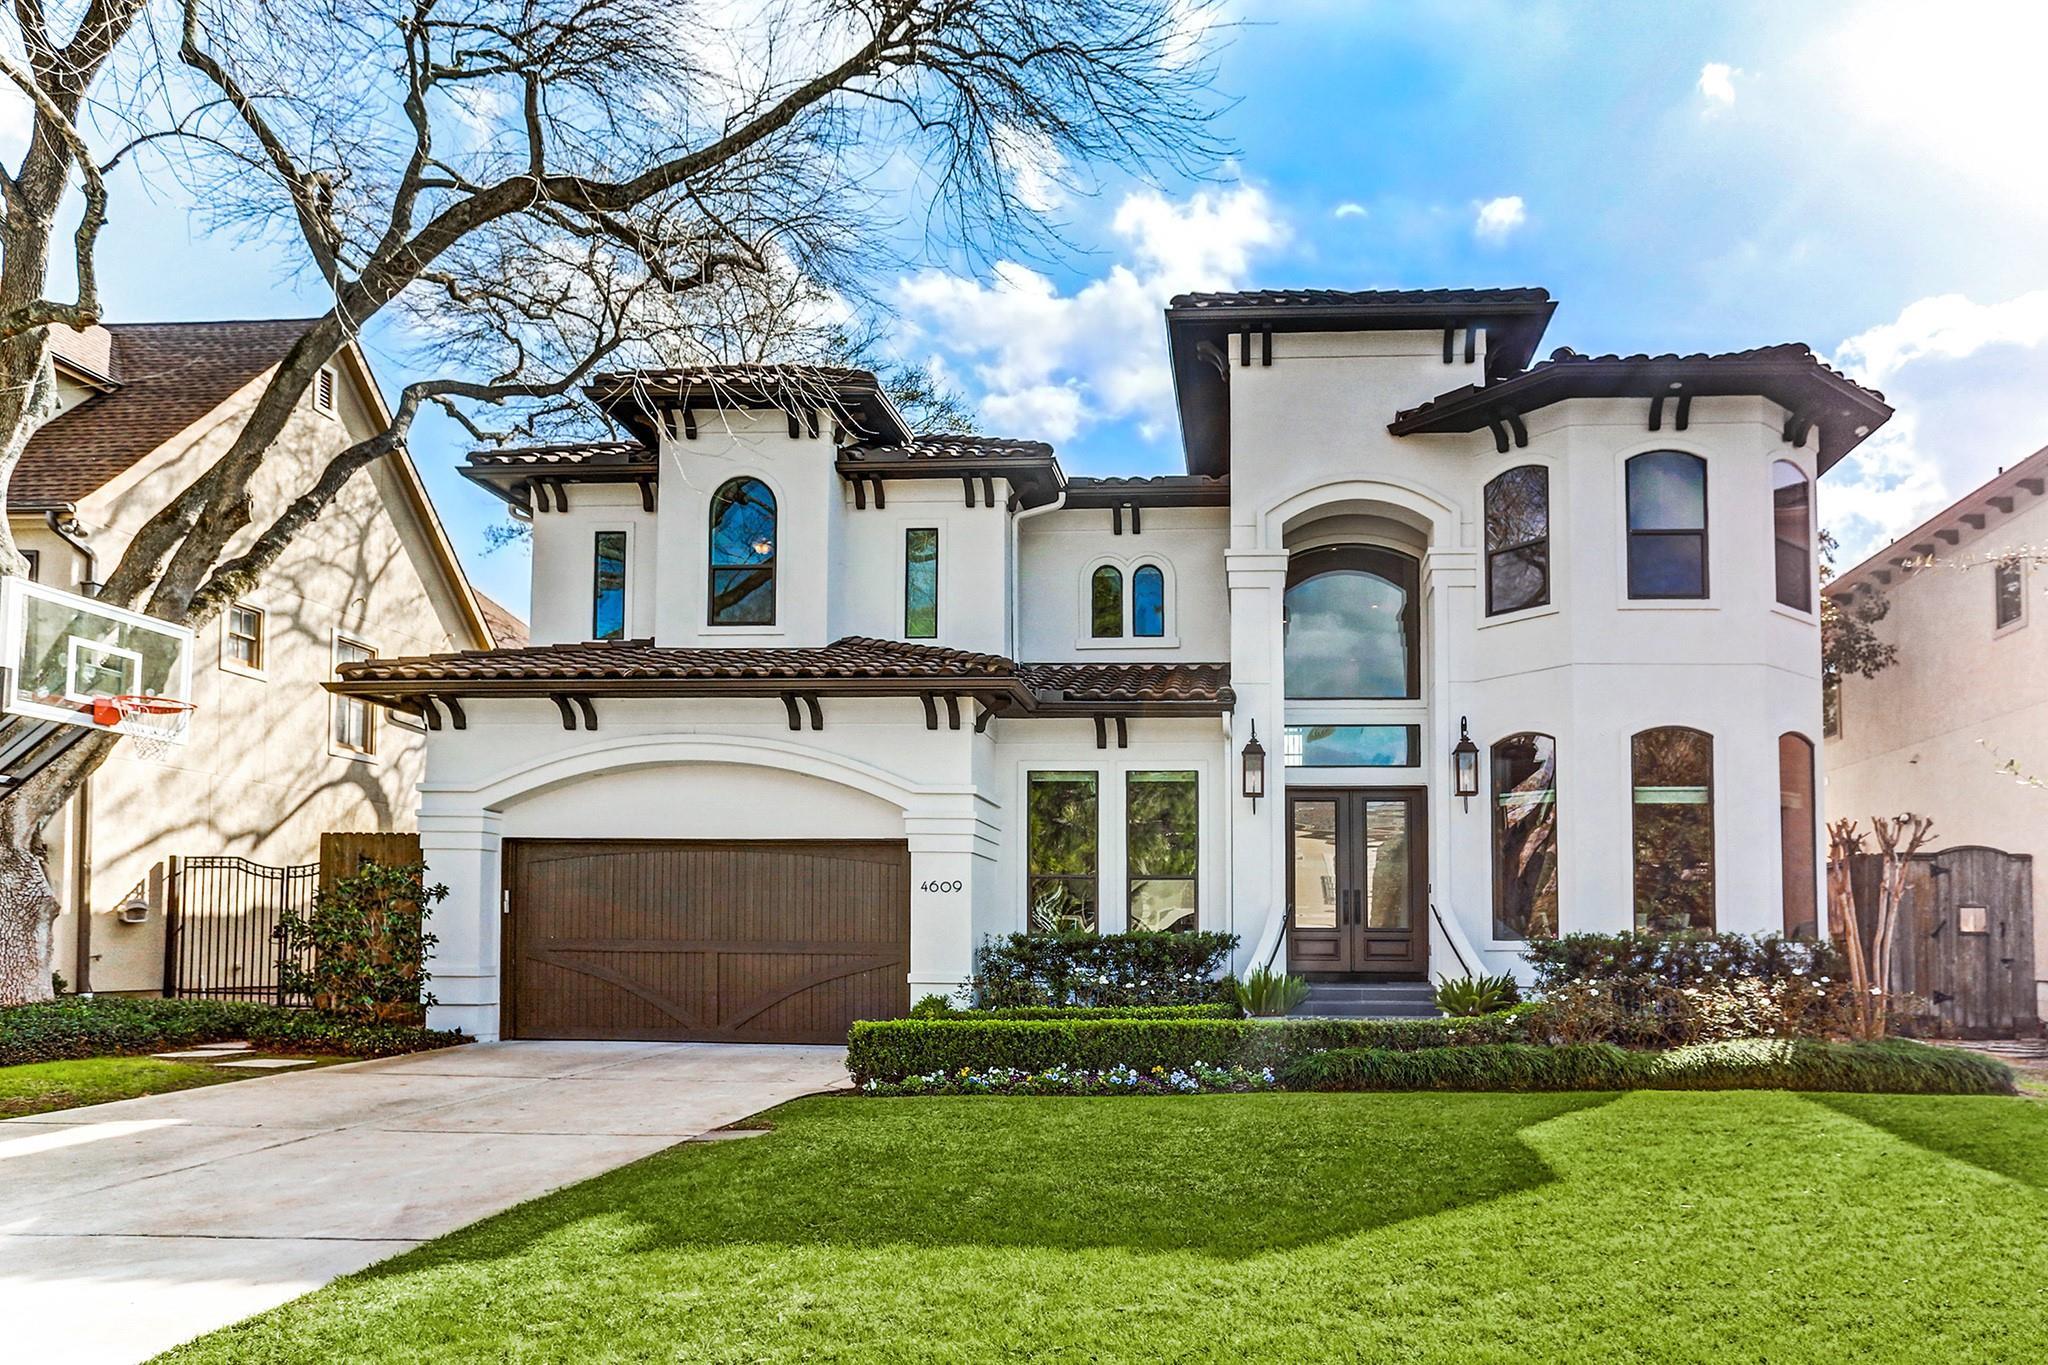 4609 Holt Street Property Photo